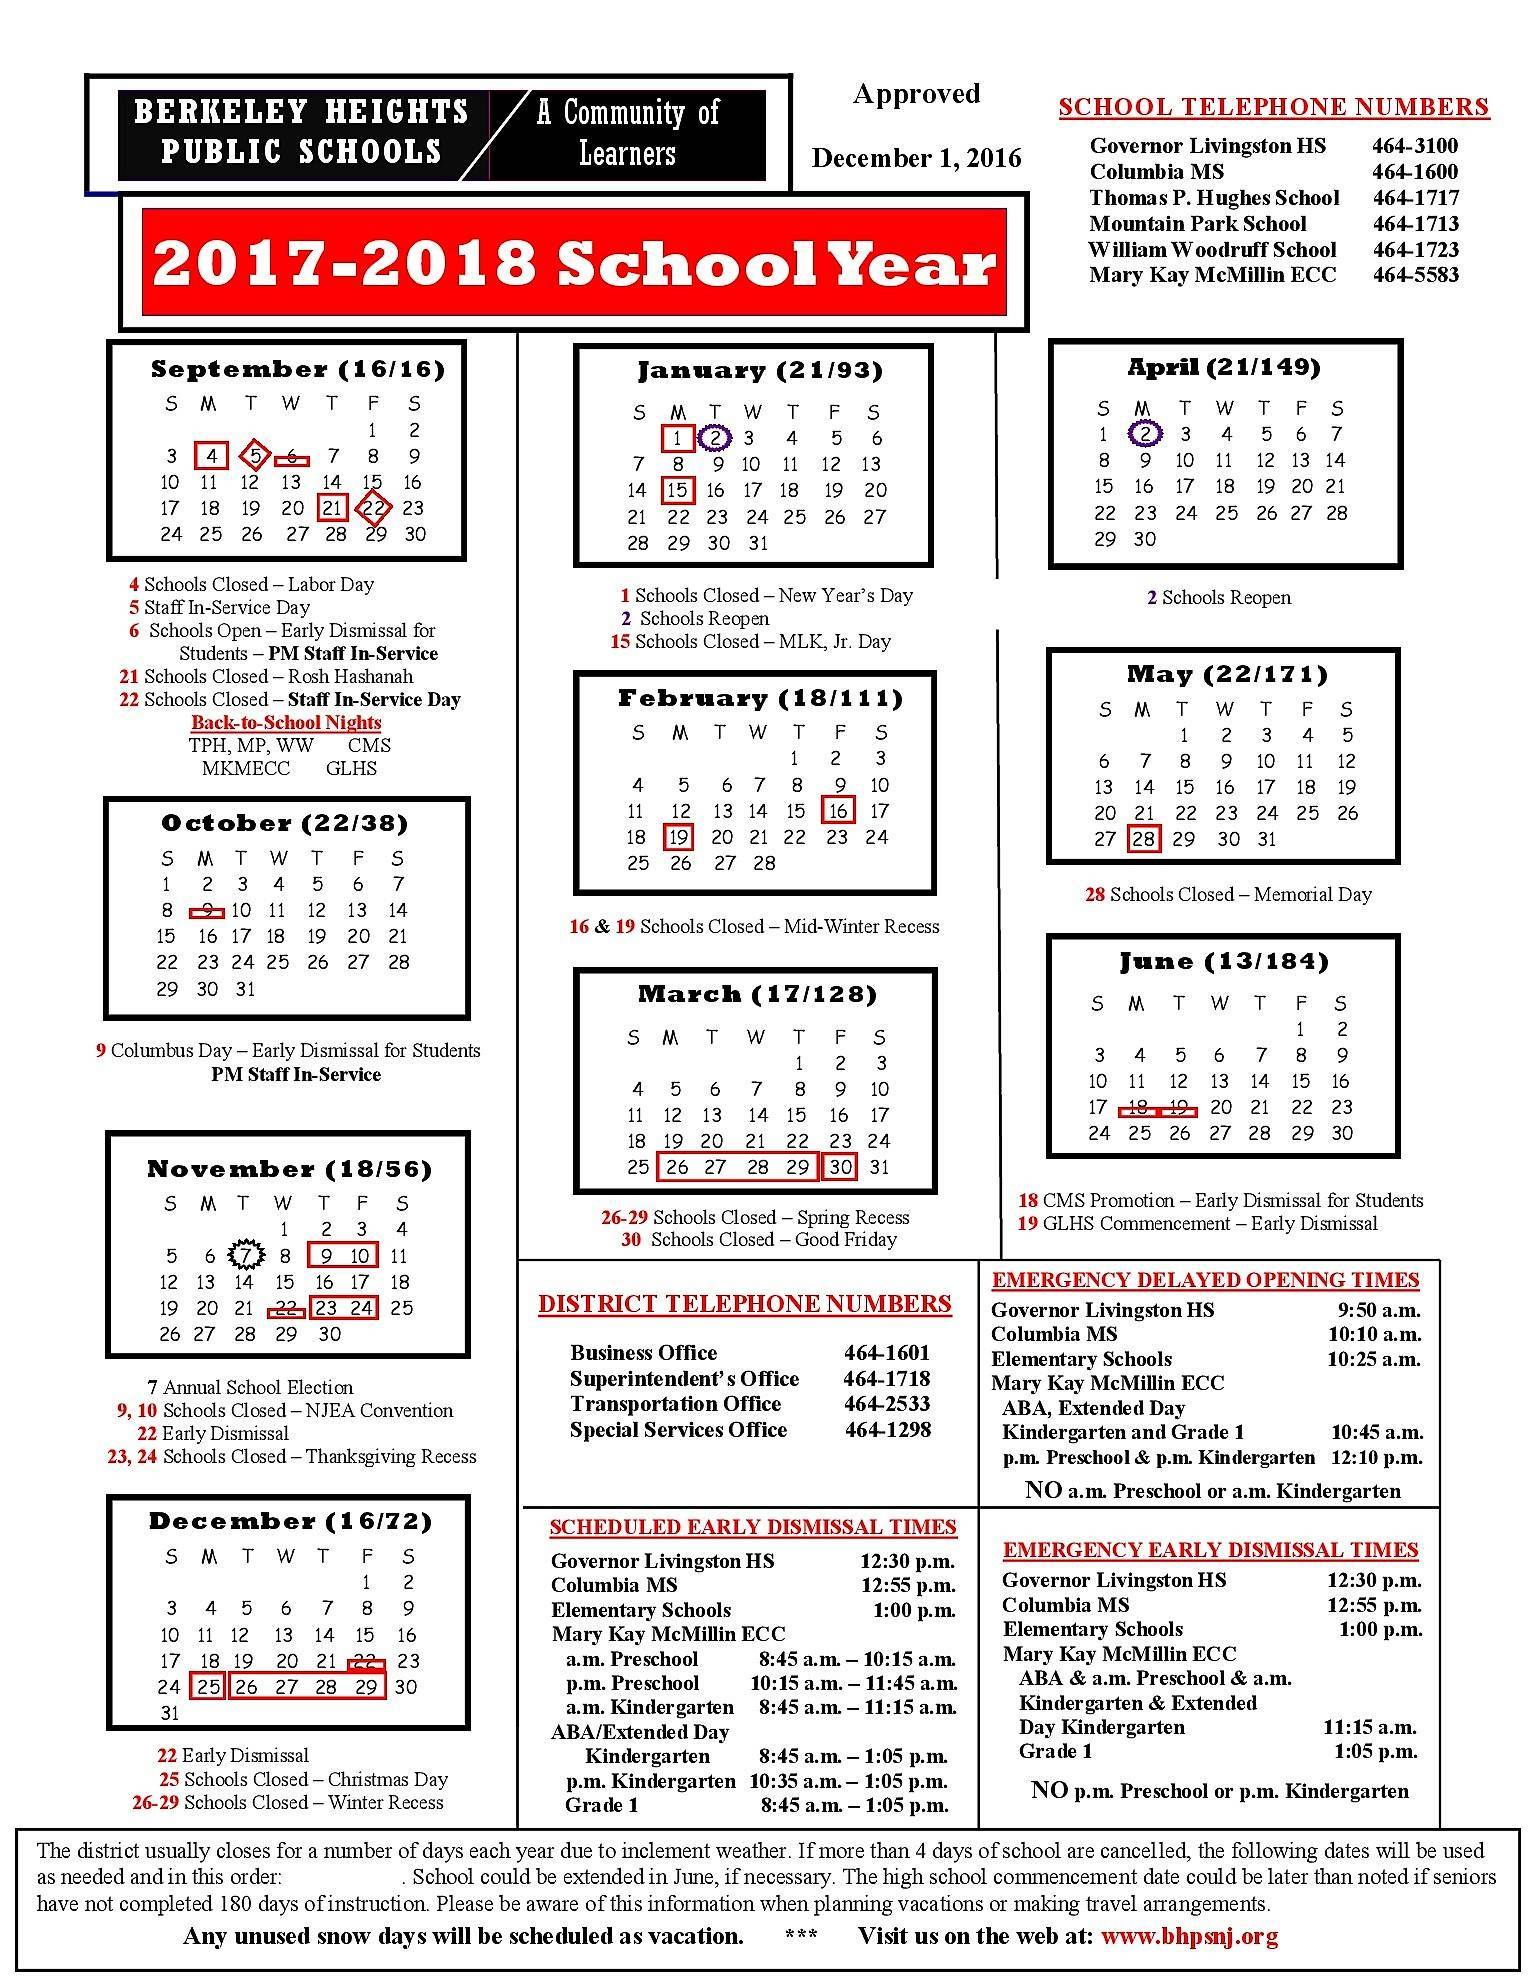 Berkeley County School Calendar 2016 2020 Berkeley Heights BOE Approves 2017 2018 School Calendar | TAPinto